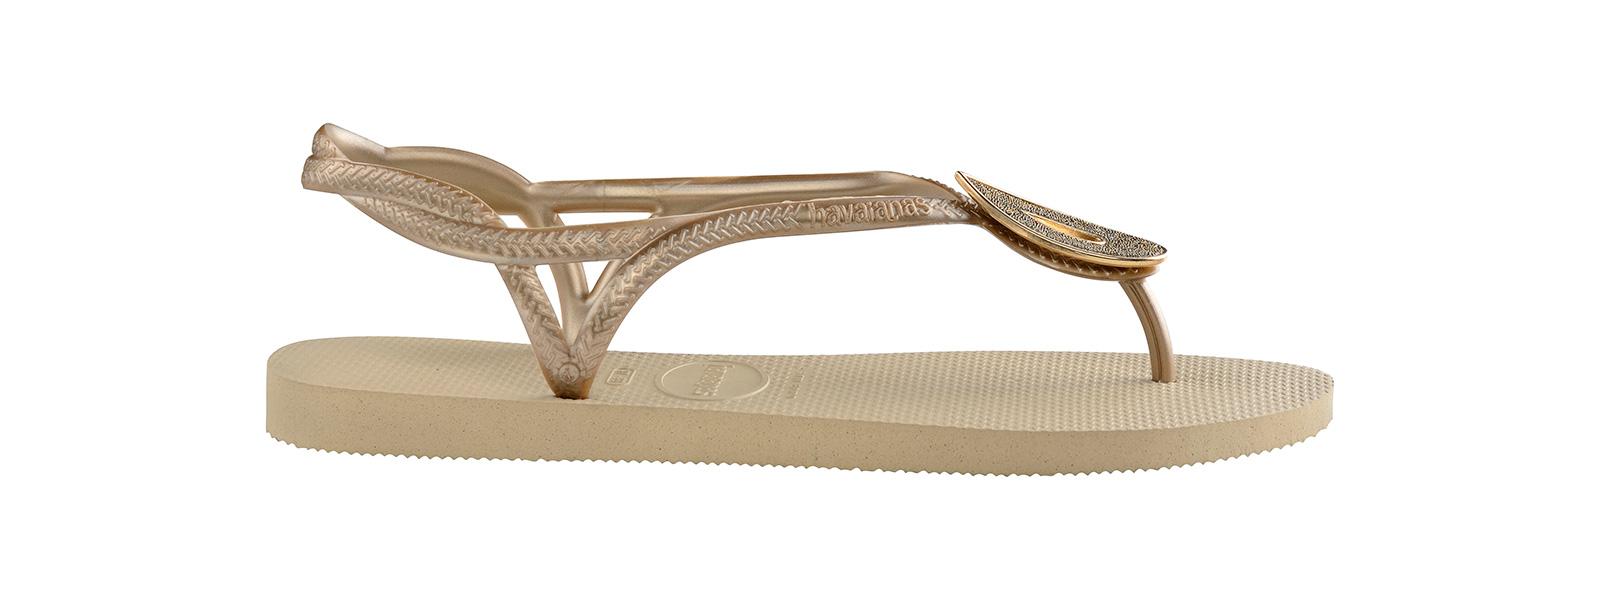 b6867cba7e5d Sandals Flip-flops - Havaianas Luna Special Sand Grey